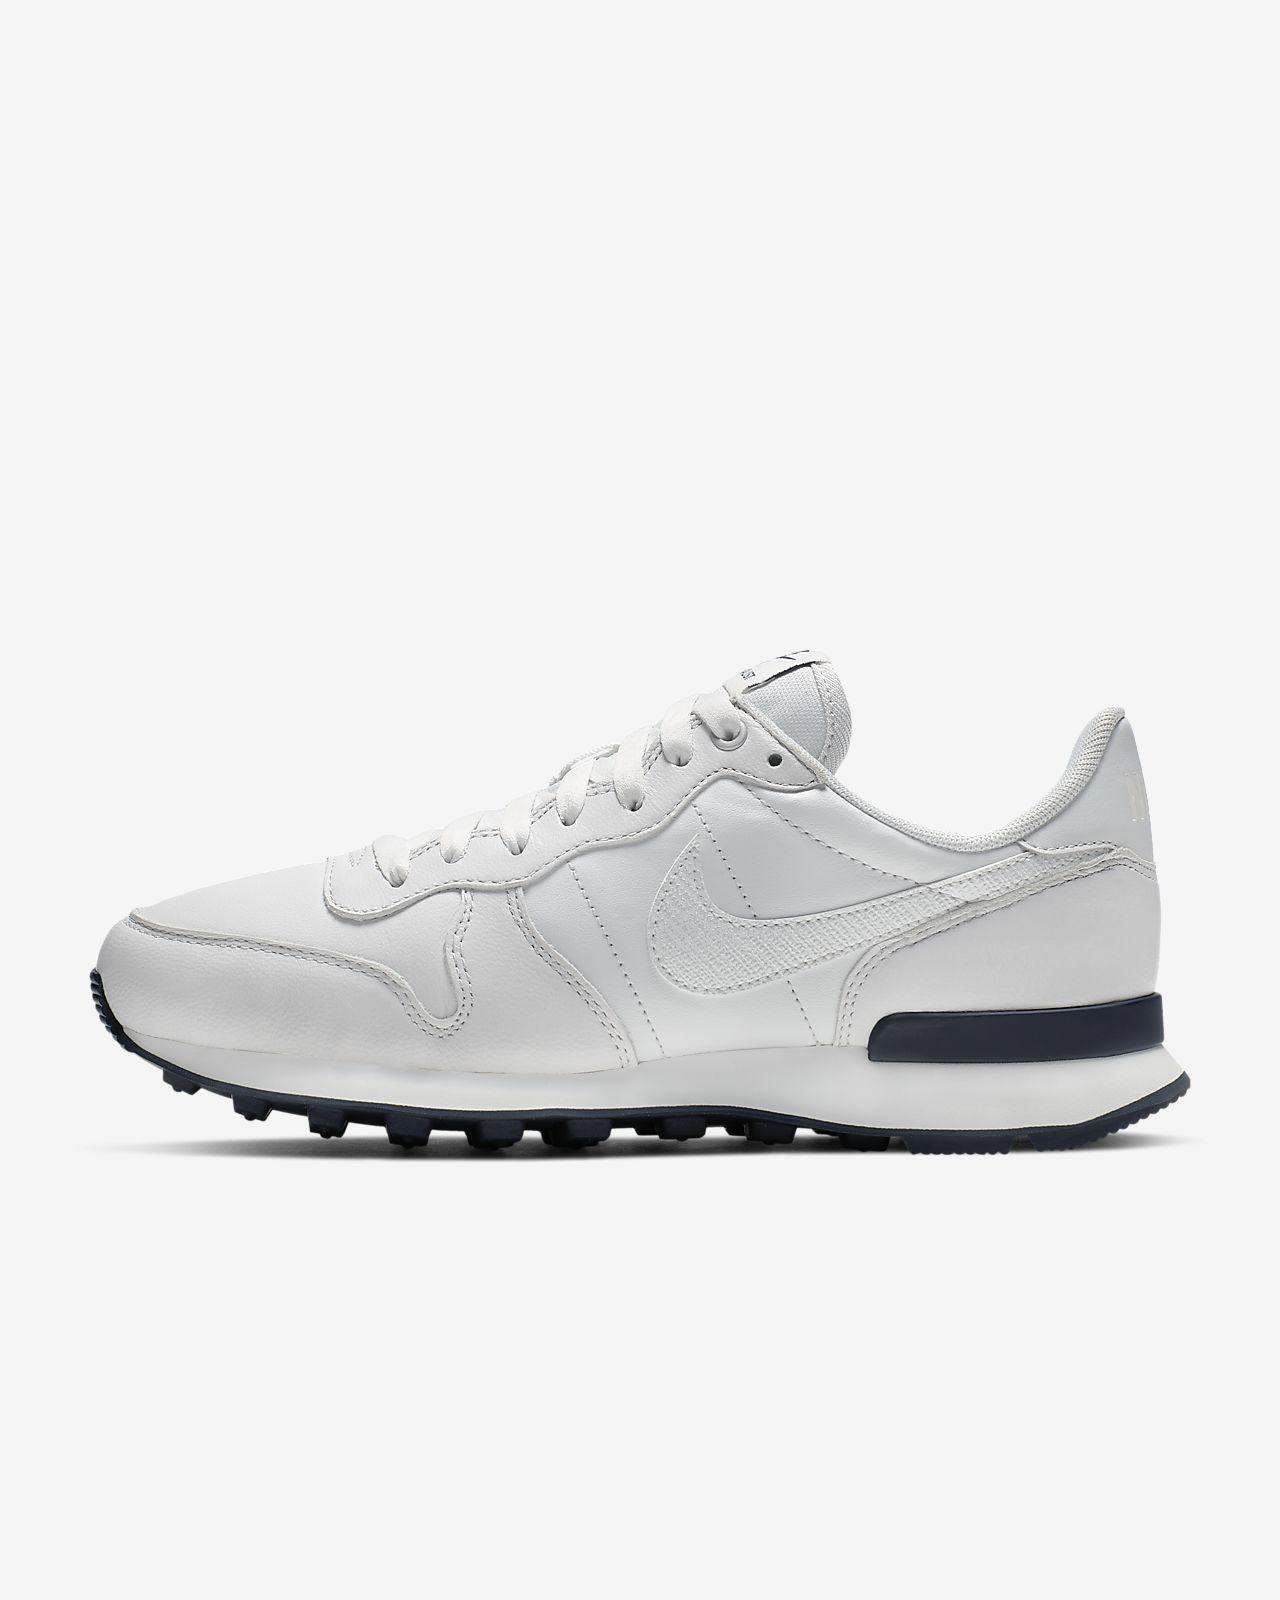 new concept b6c28 8ffbd Nike Internationalist Premium